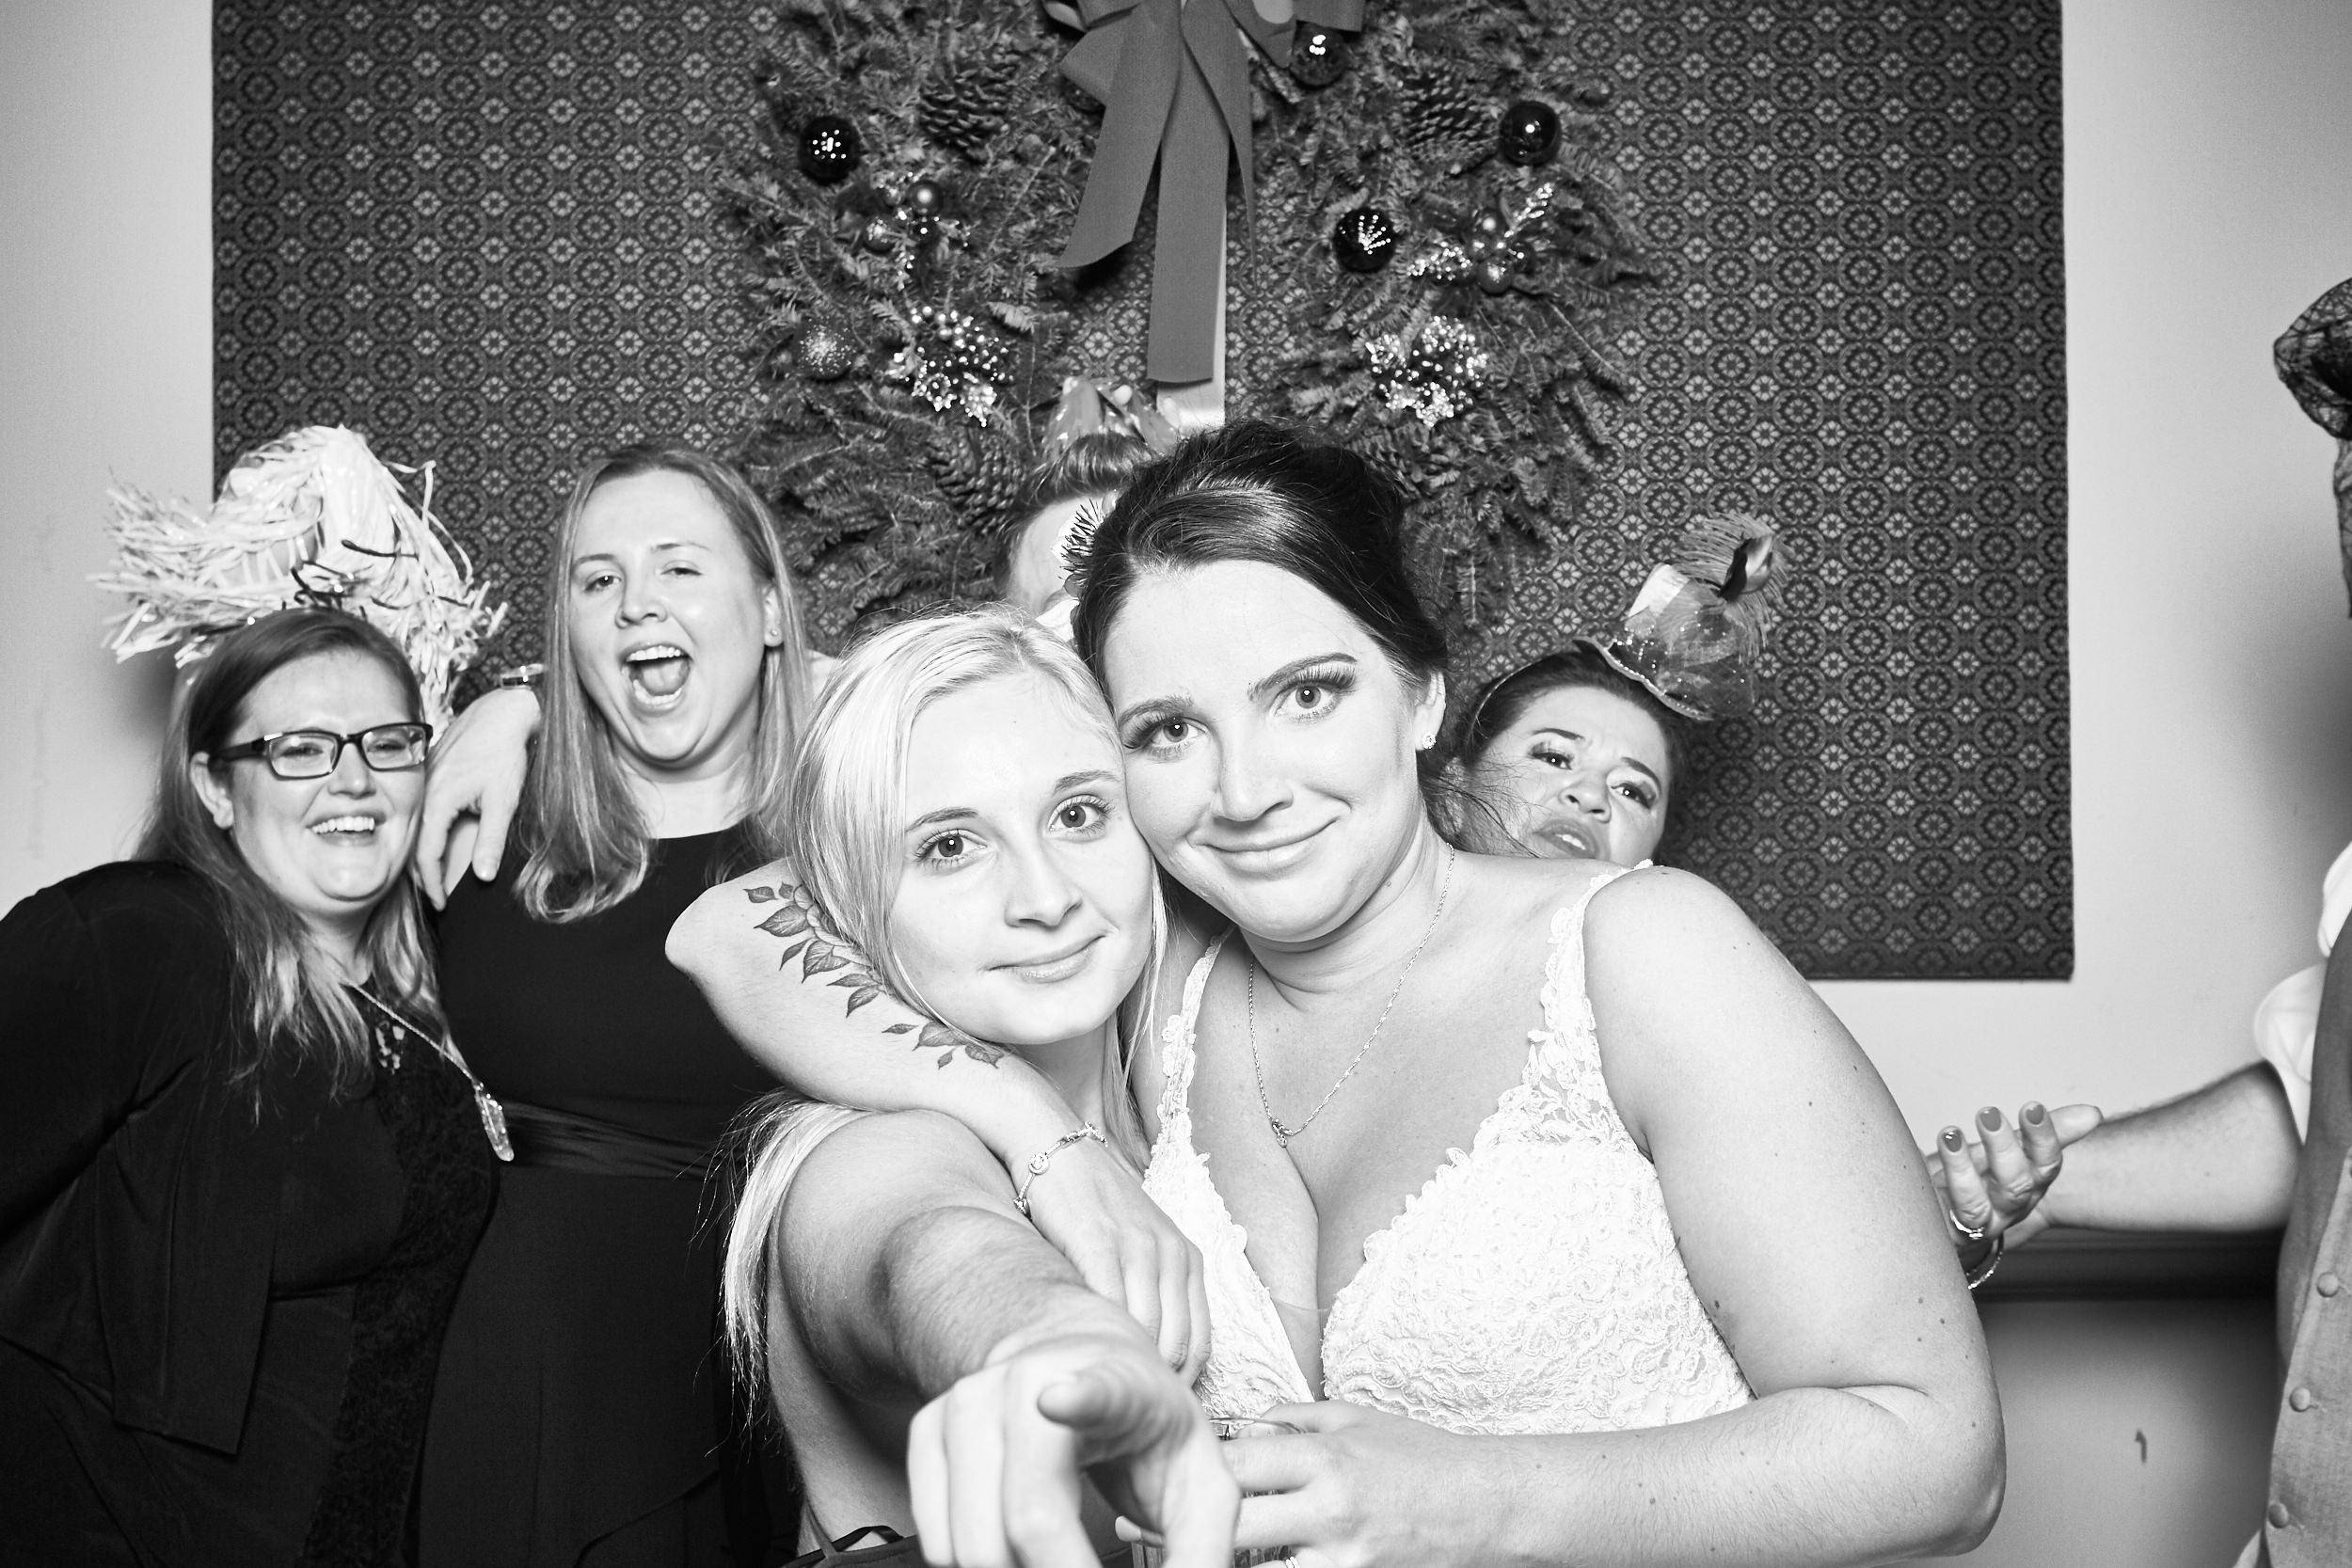 Alexa-James-Wedding-Photo-Booth994.jpg